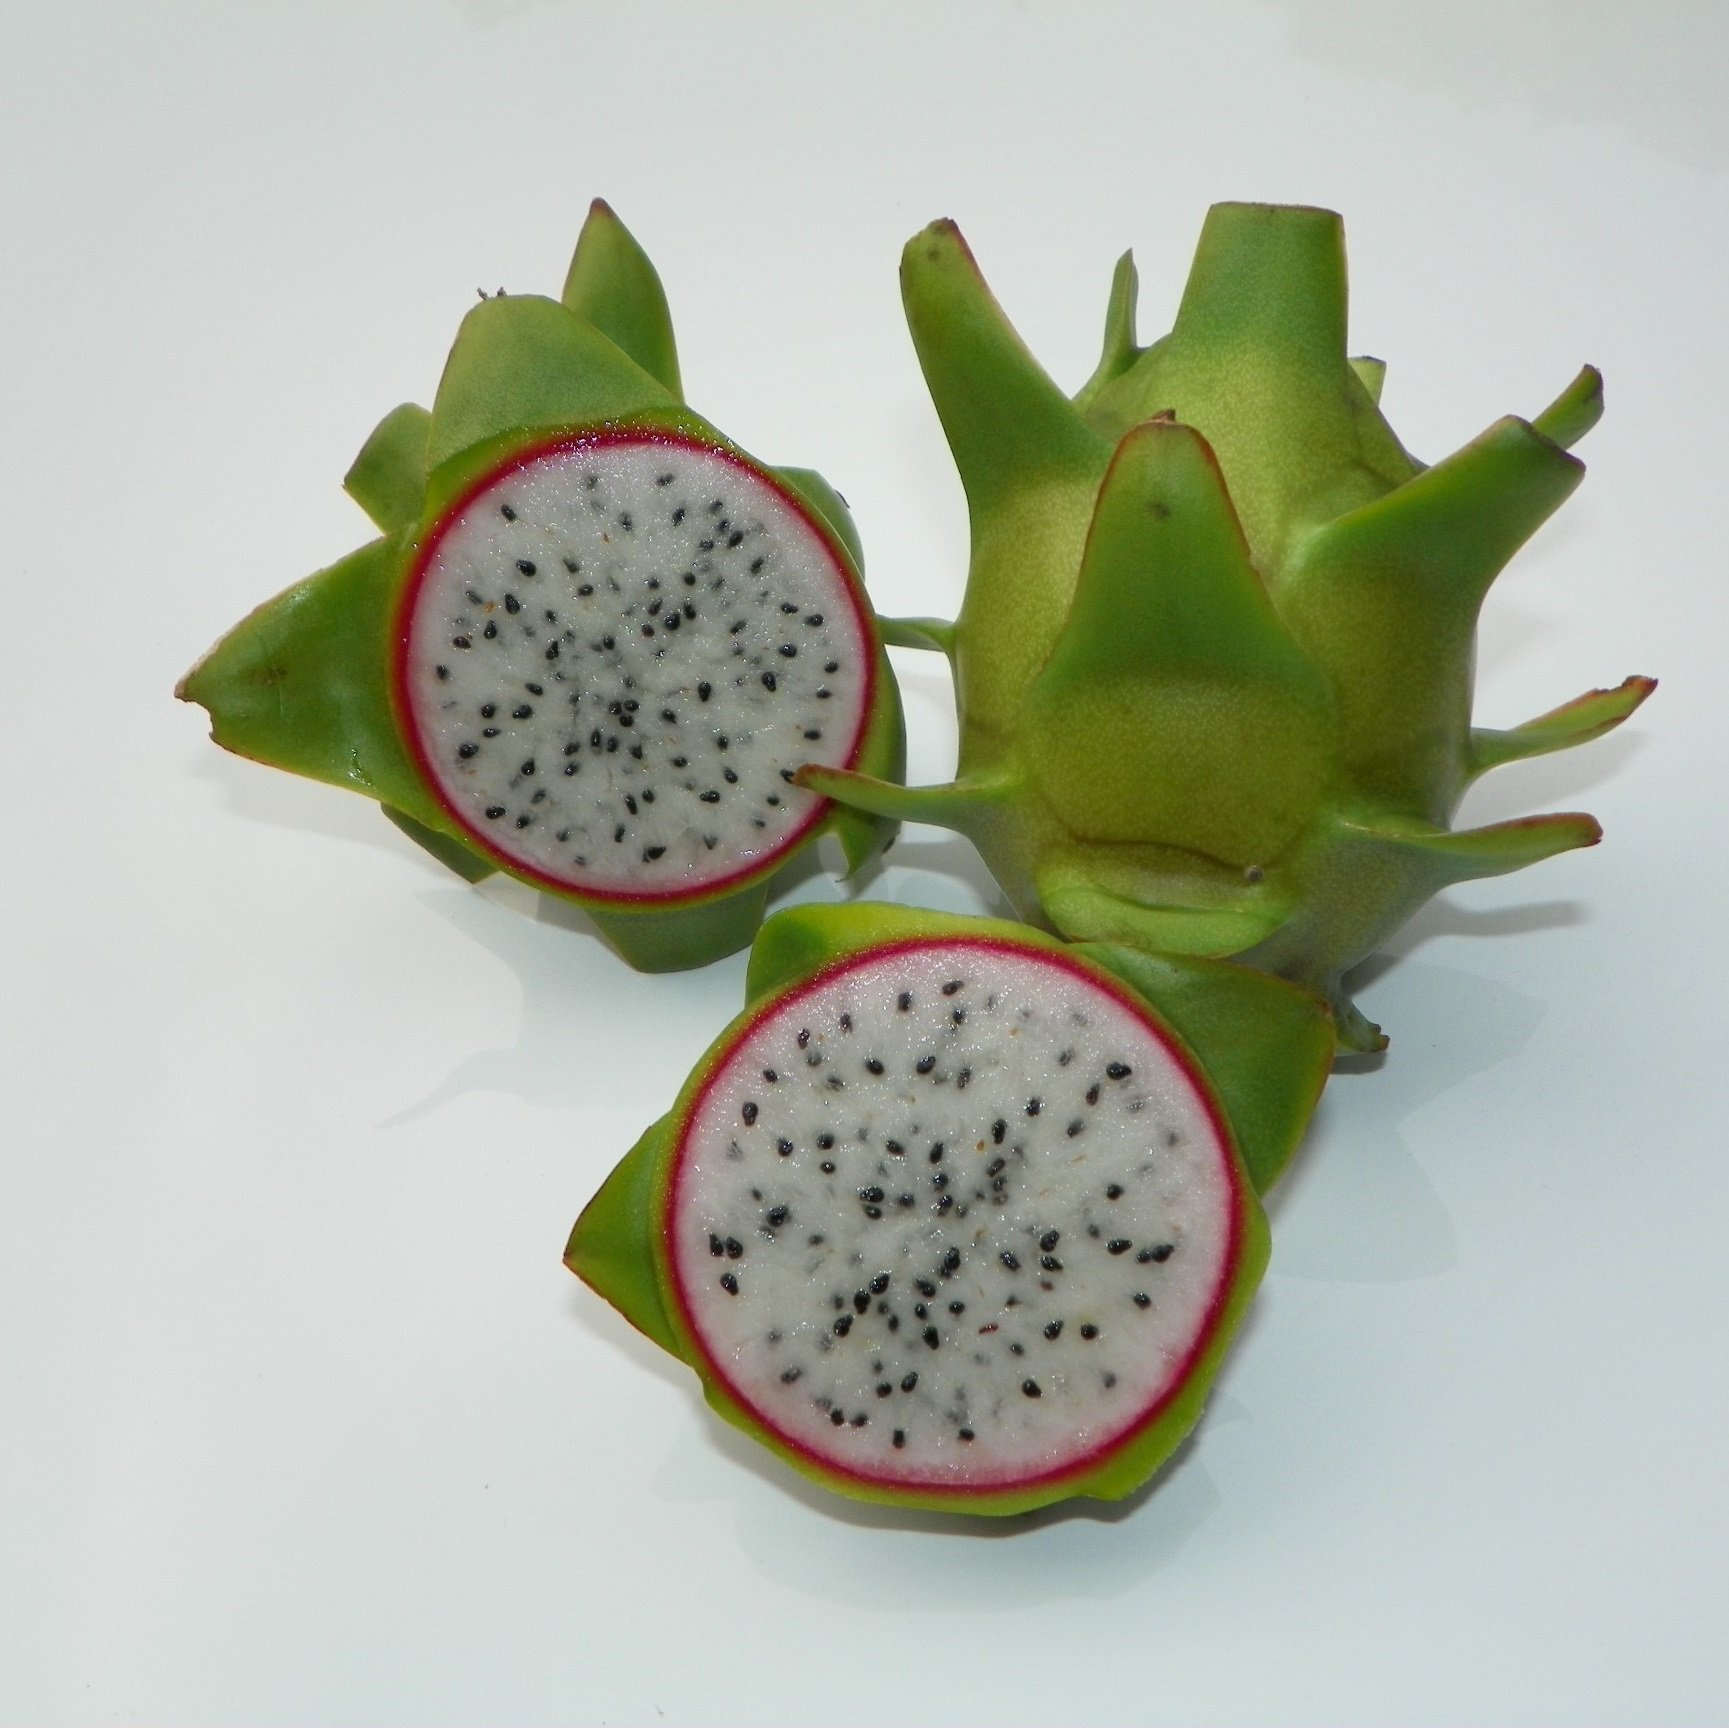 Connie Mayer Dragon Fruit Sliced